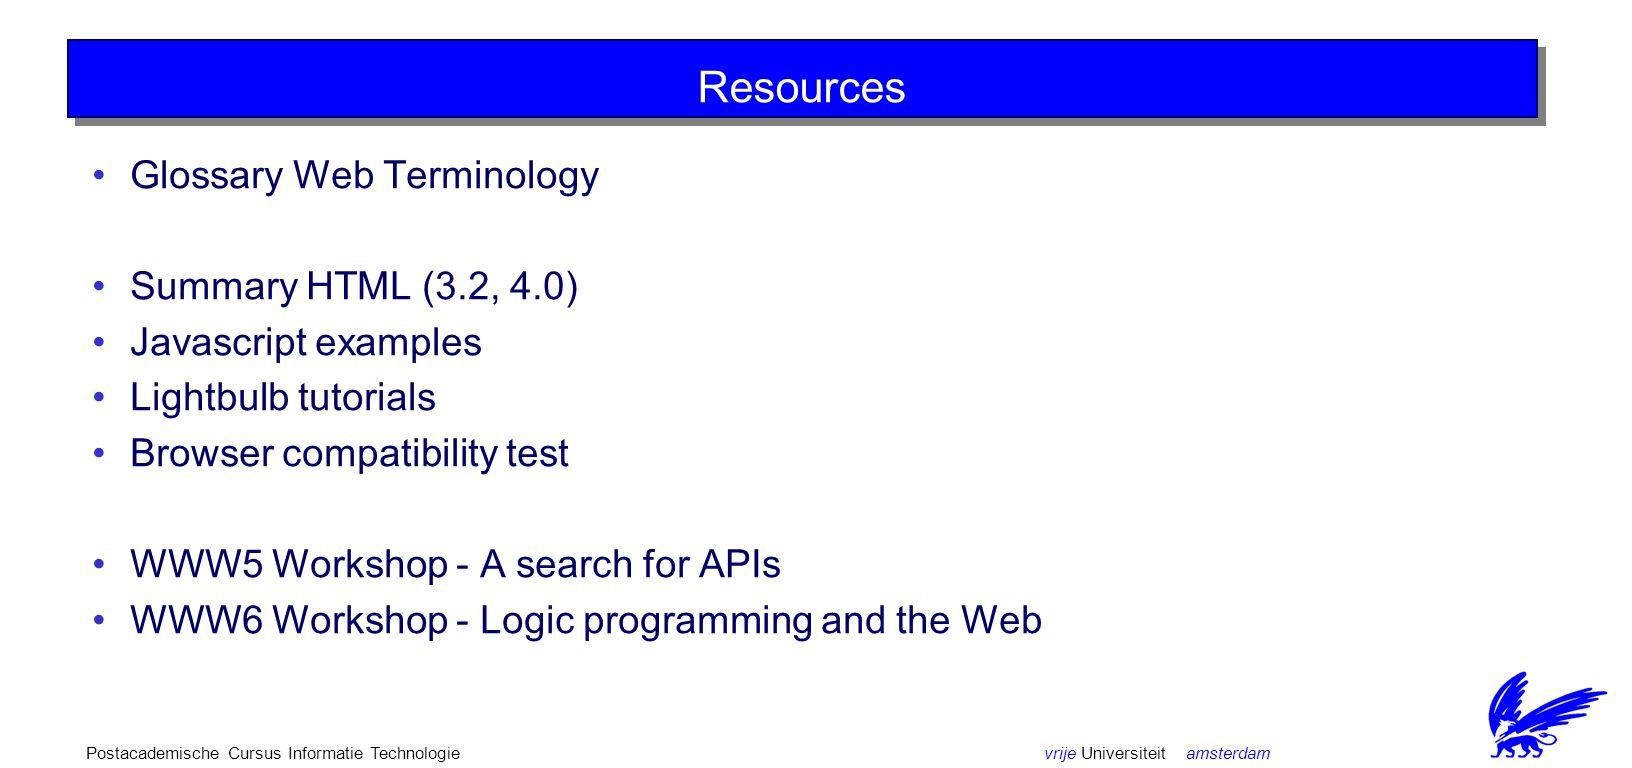 vrije Universiteit amsterdamPostacademische Cursus Informatie Technologie Course Material P. Fraternali, Web Development Tools: a survey, Proceedings